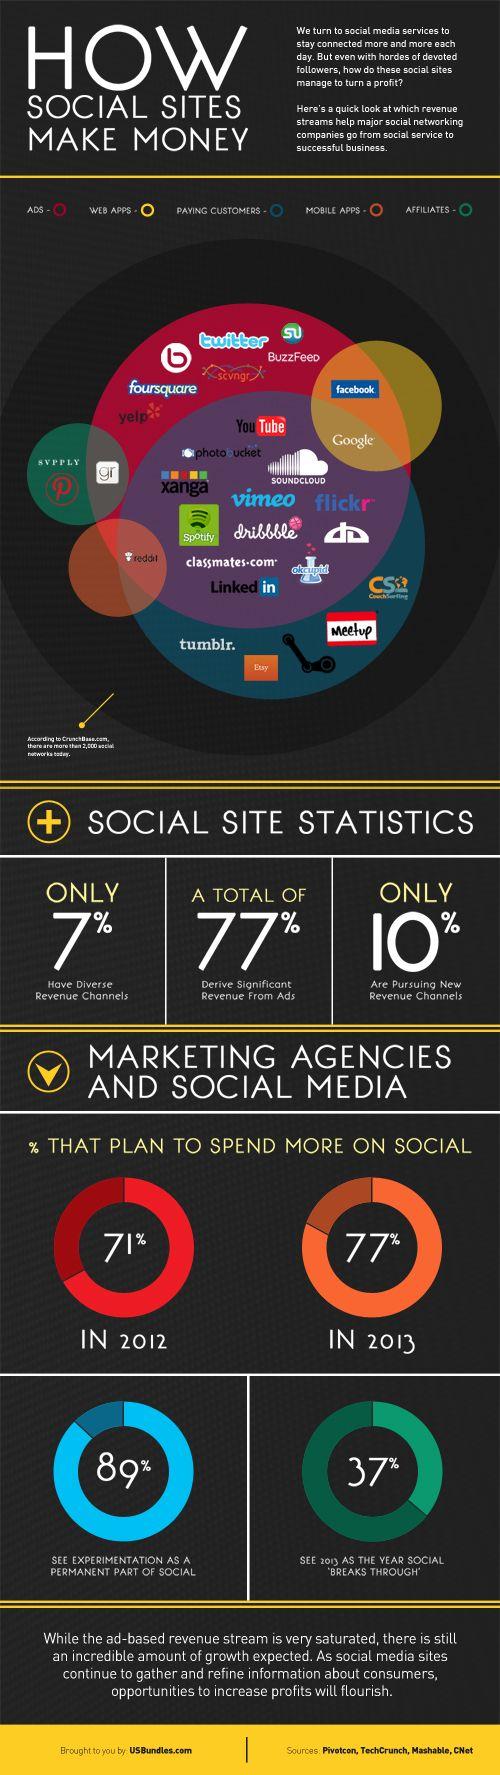 How #Social Sites Make Money -   Social times http://bit.ly/A2pTdn